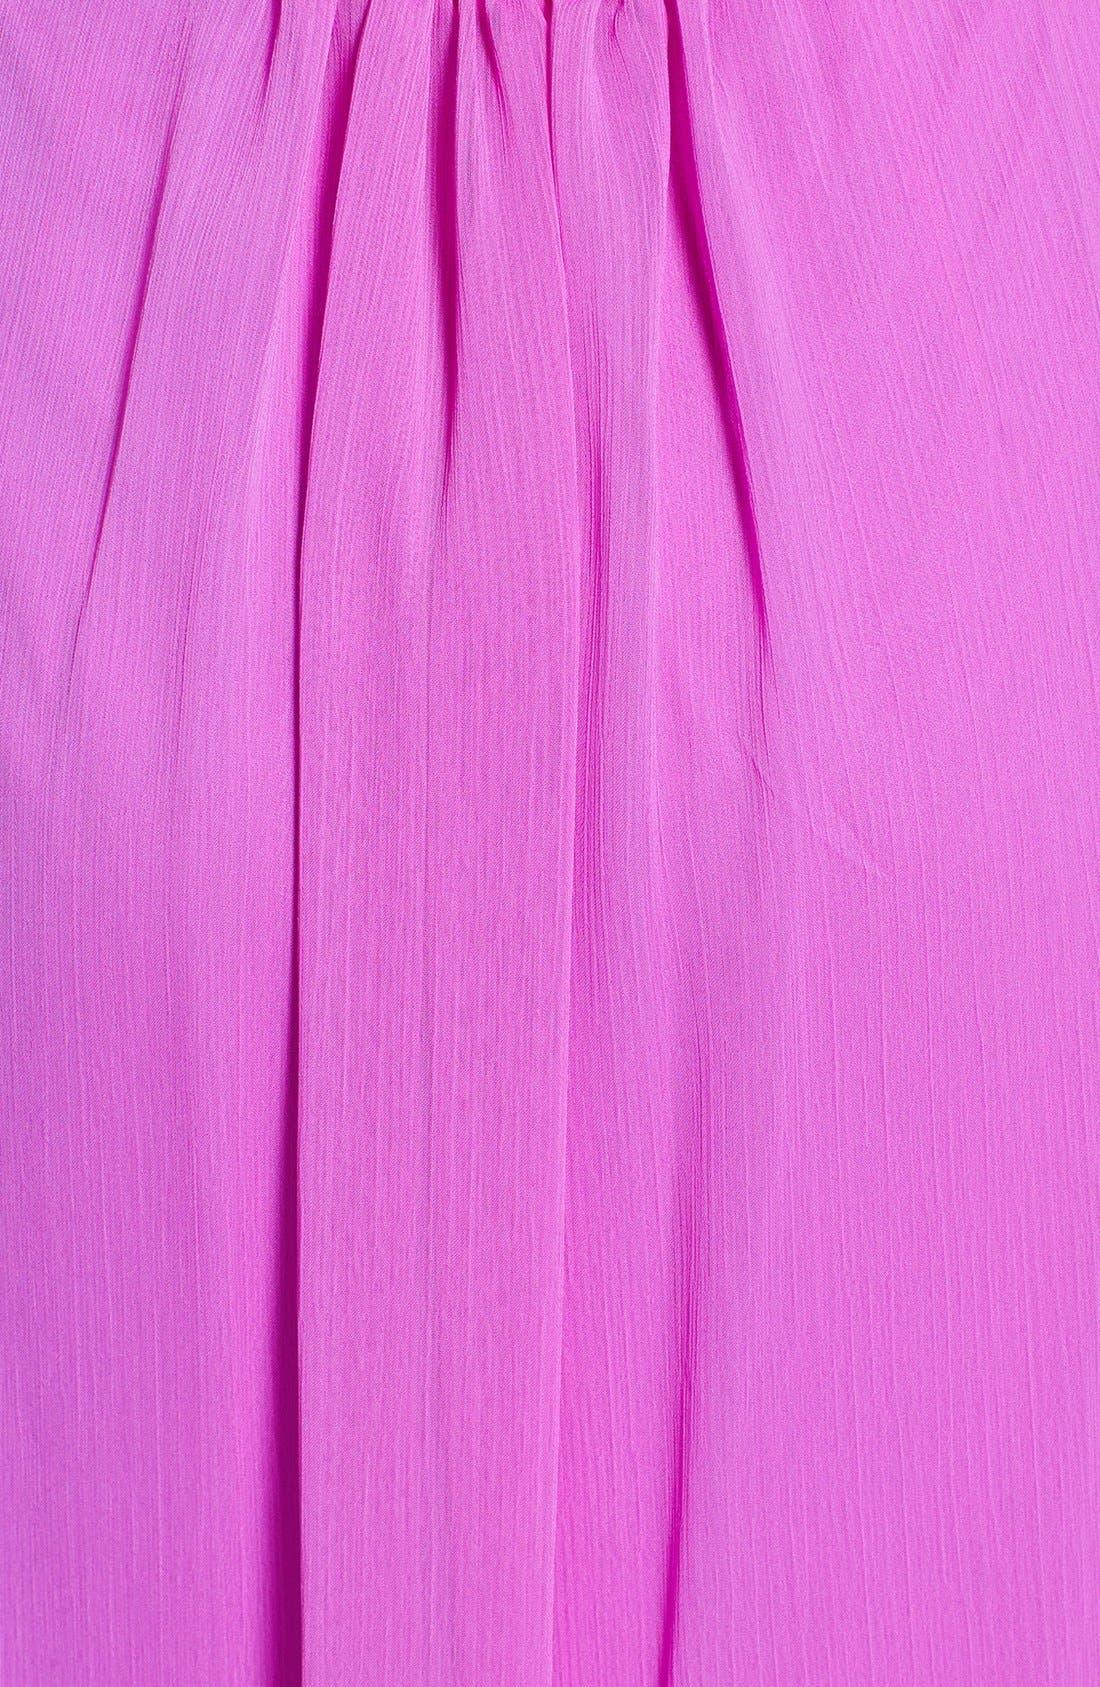 Alternate Image 3  - Jessica Simpson Ruffled Open Back Chiffon Maxi Dress